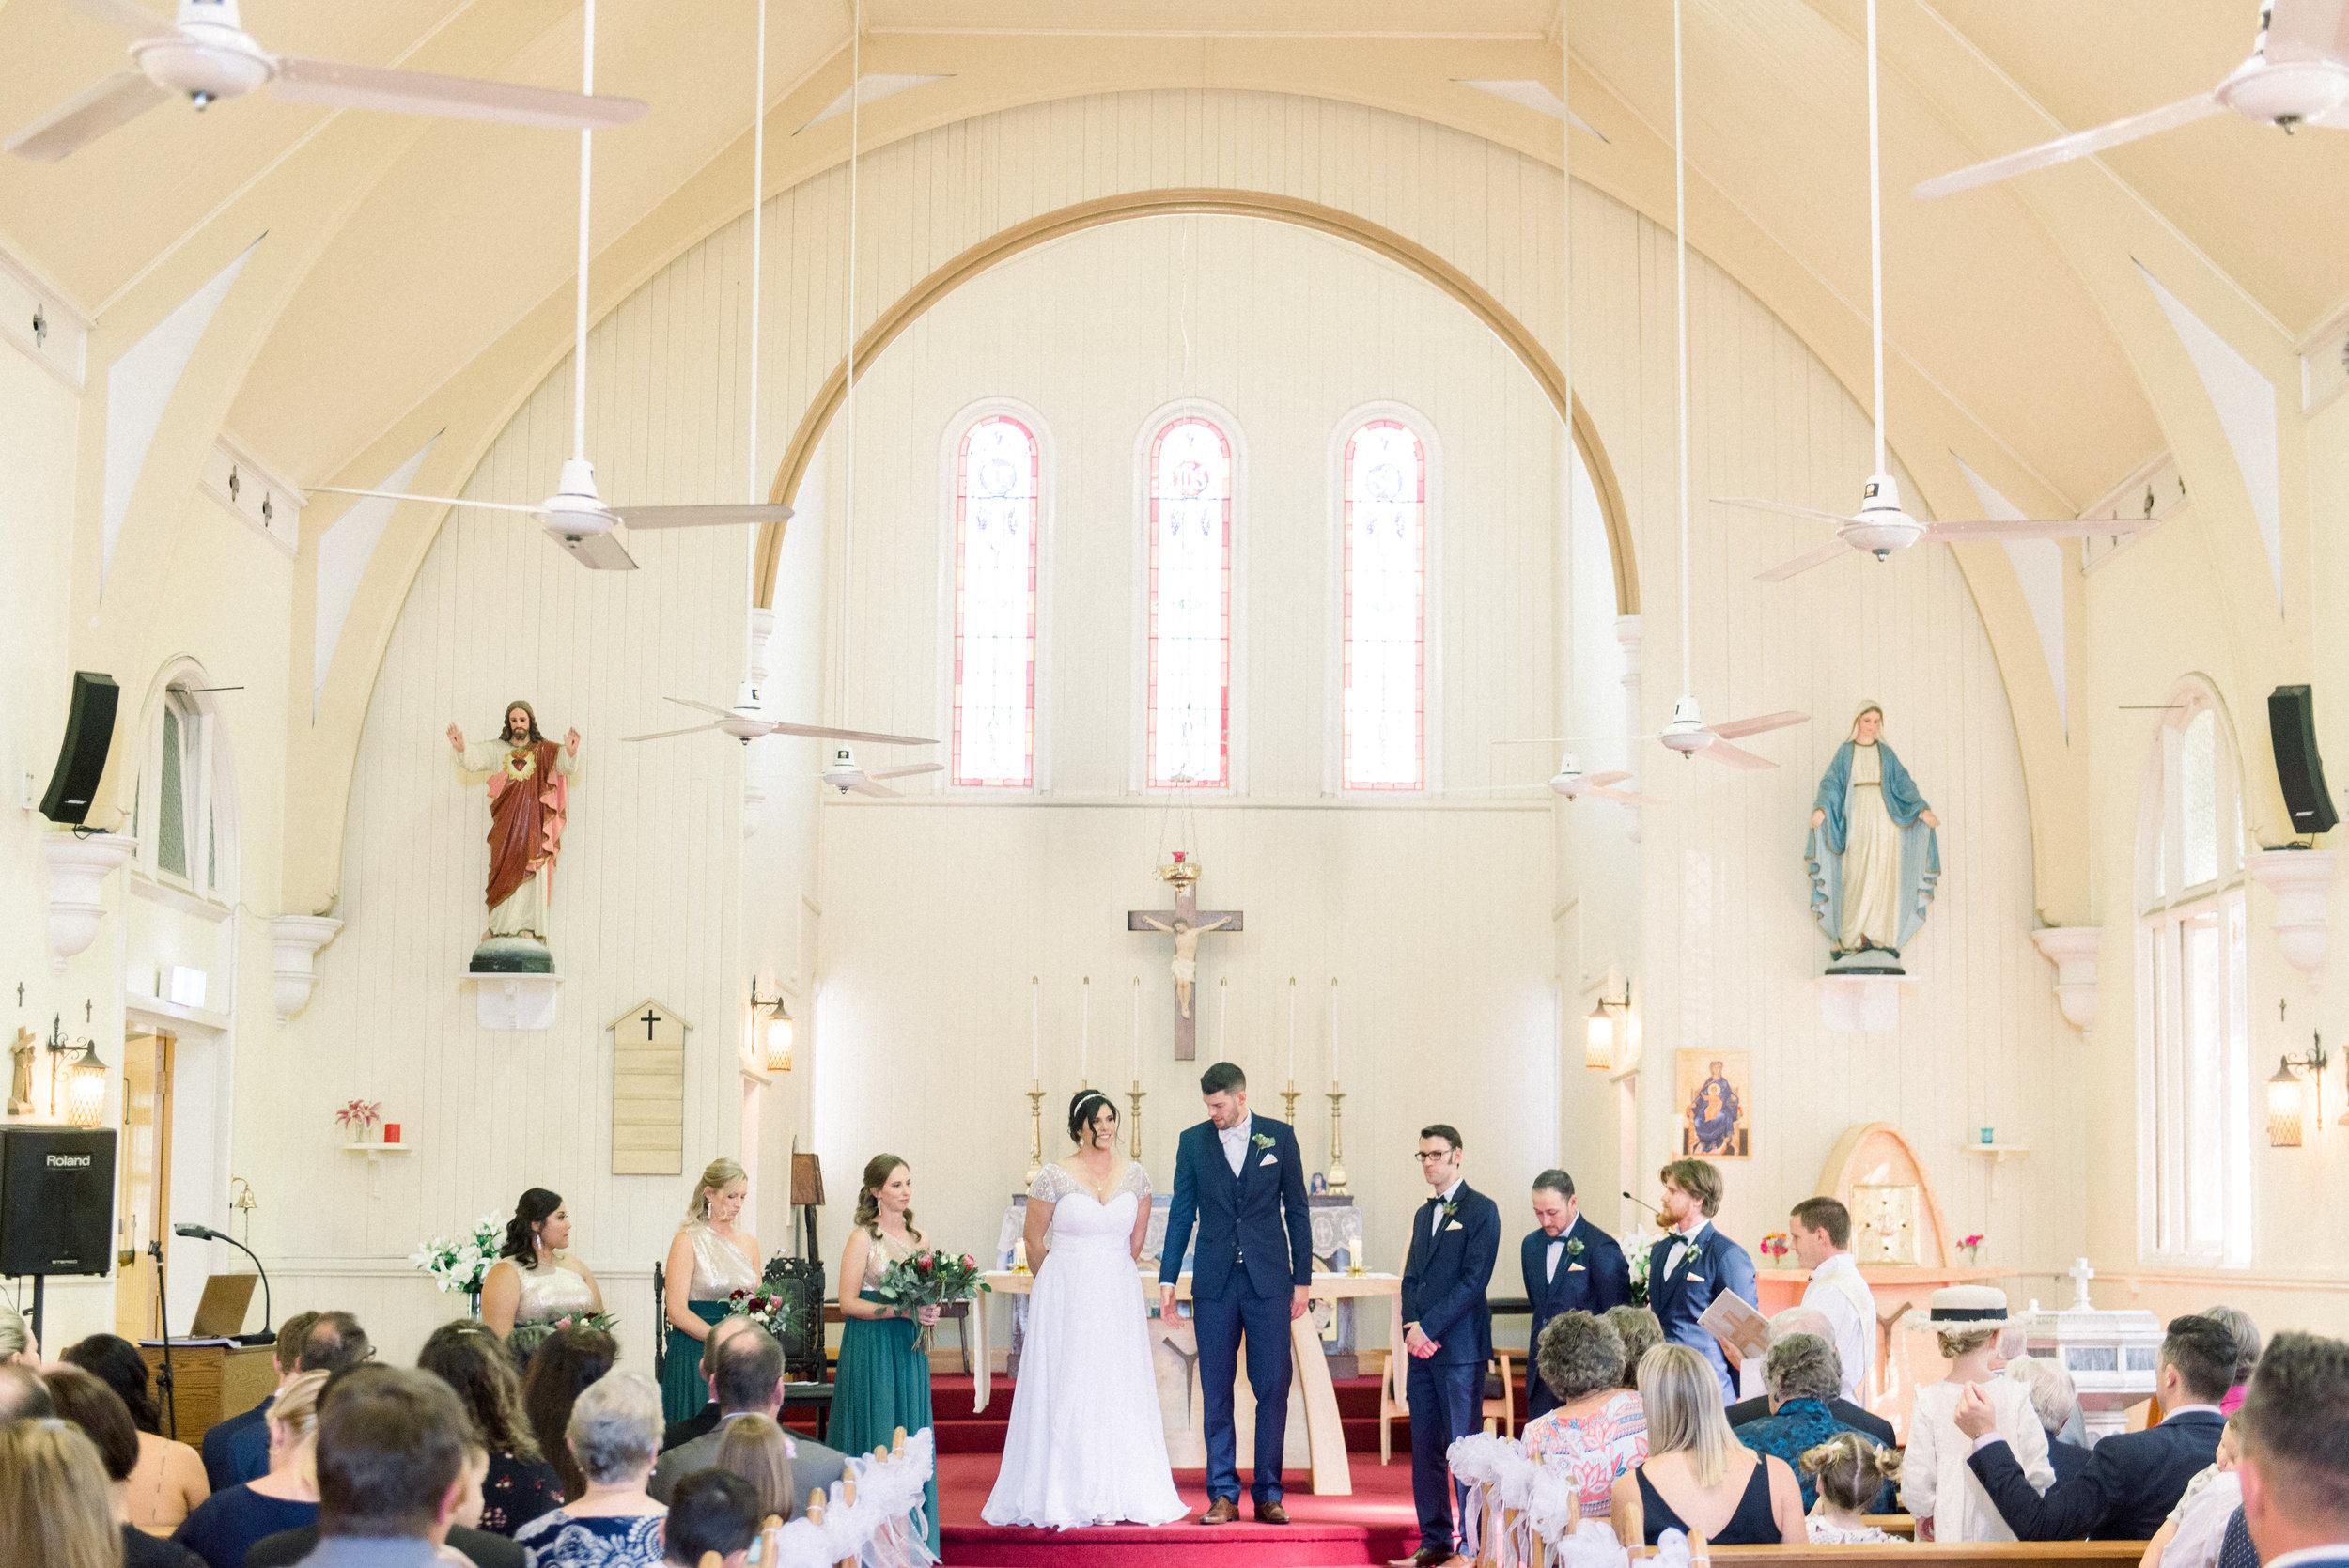 brisbane-city-wedding-photography-film-light-loft-westend-1-4.jpg